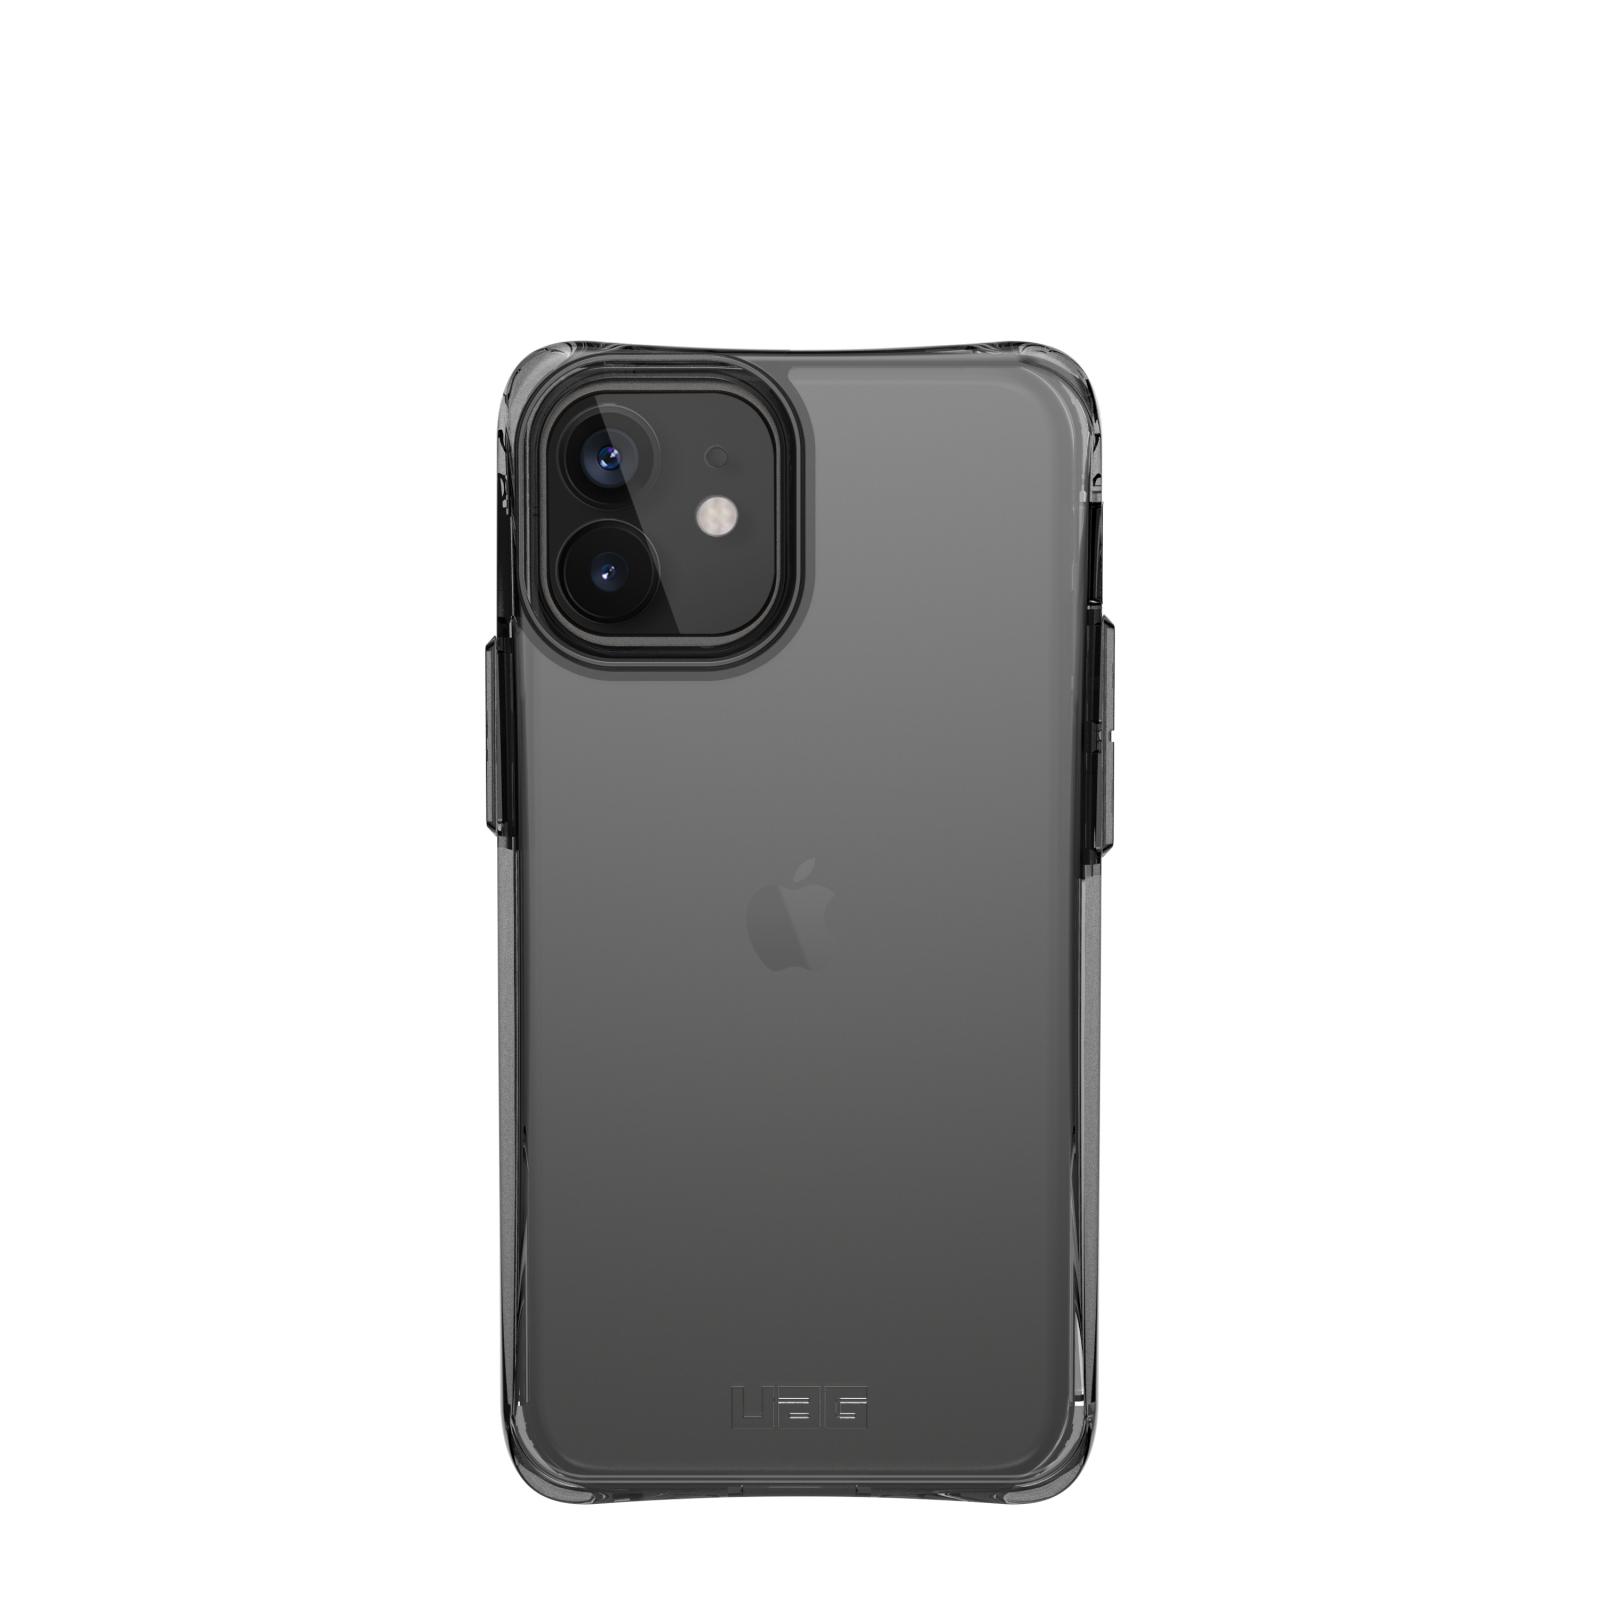 "Urban Armor Gear Plyo funda para teléfono móvil 13,7 cm (5.4"") Negro, Transparente"